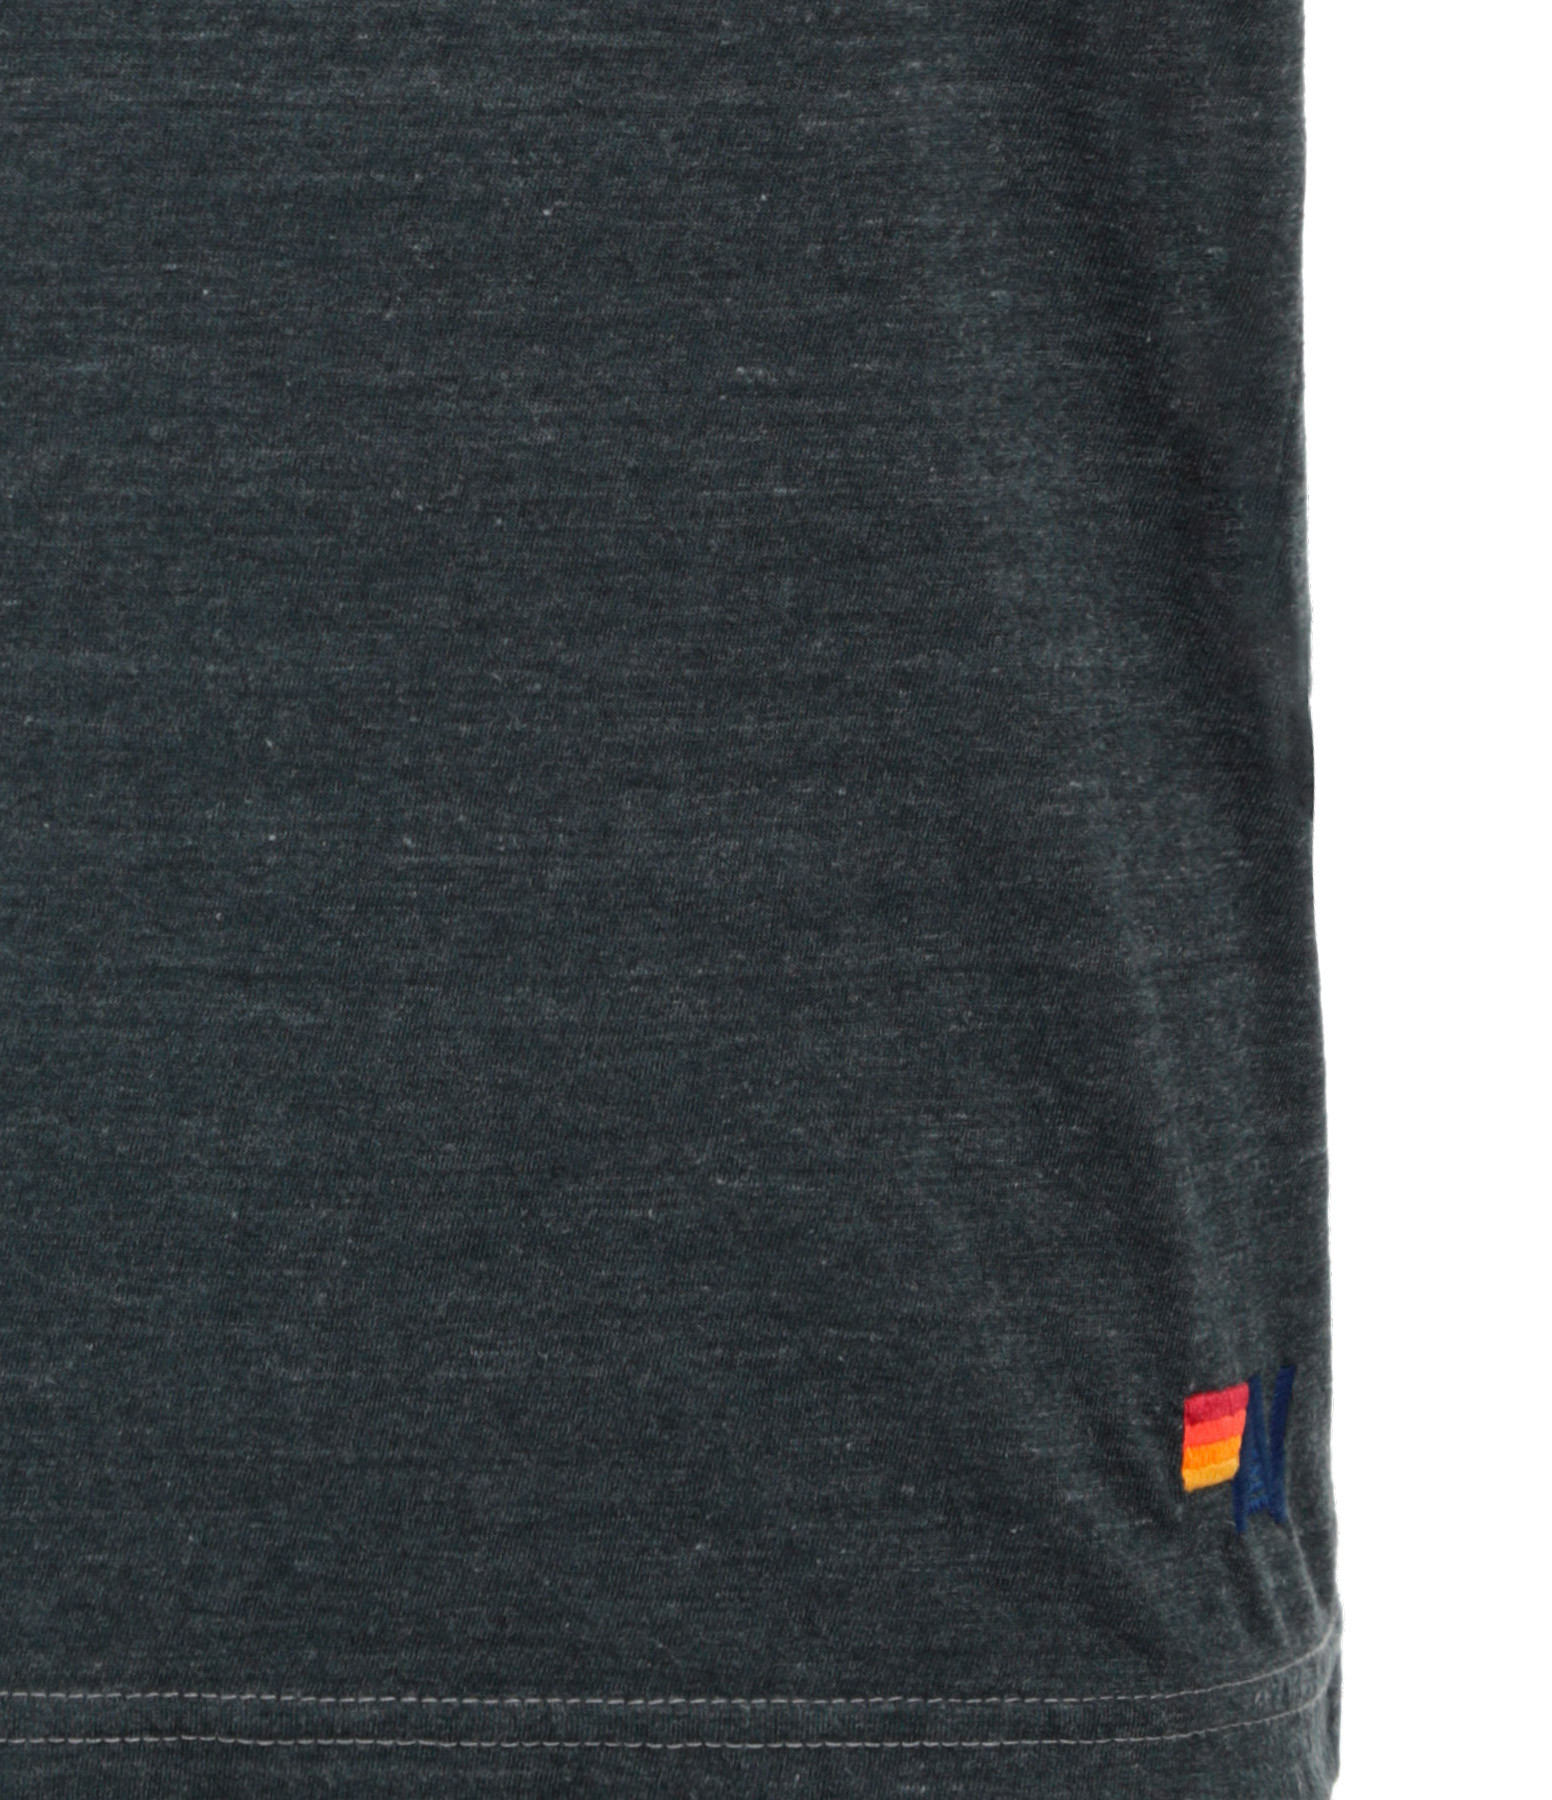 AVIATOR NATION - Tee-shirt Bolt Coton Charbon